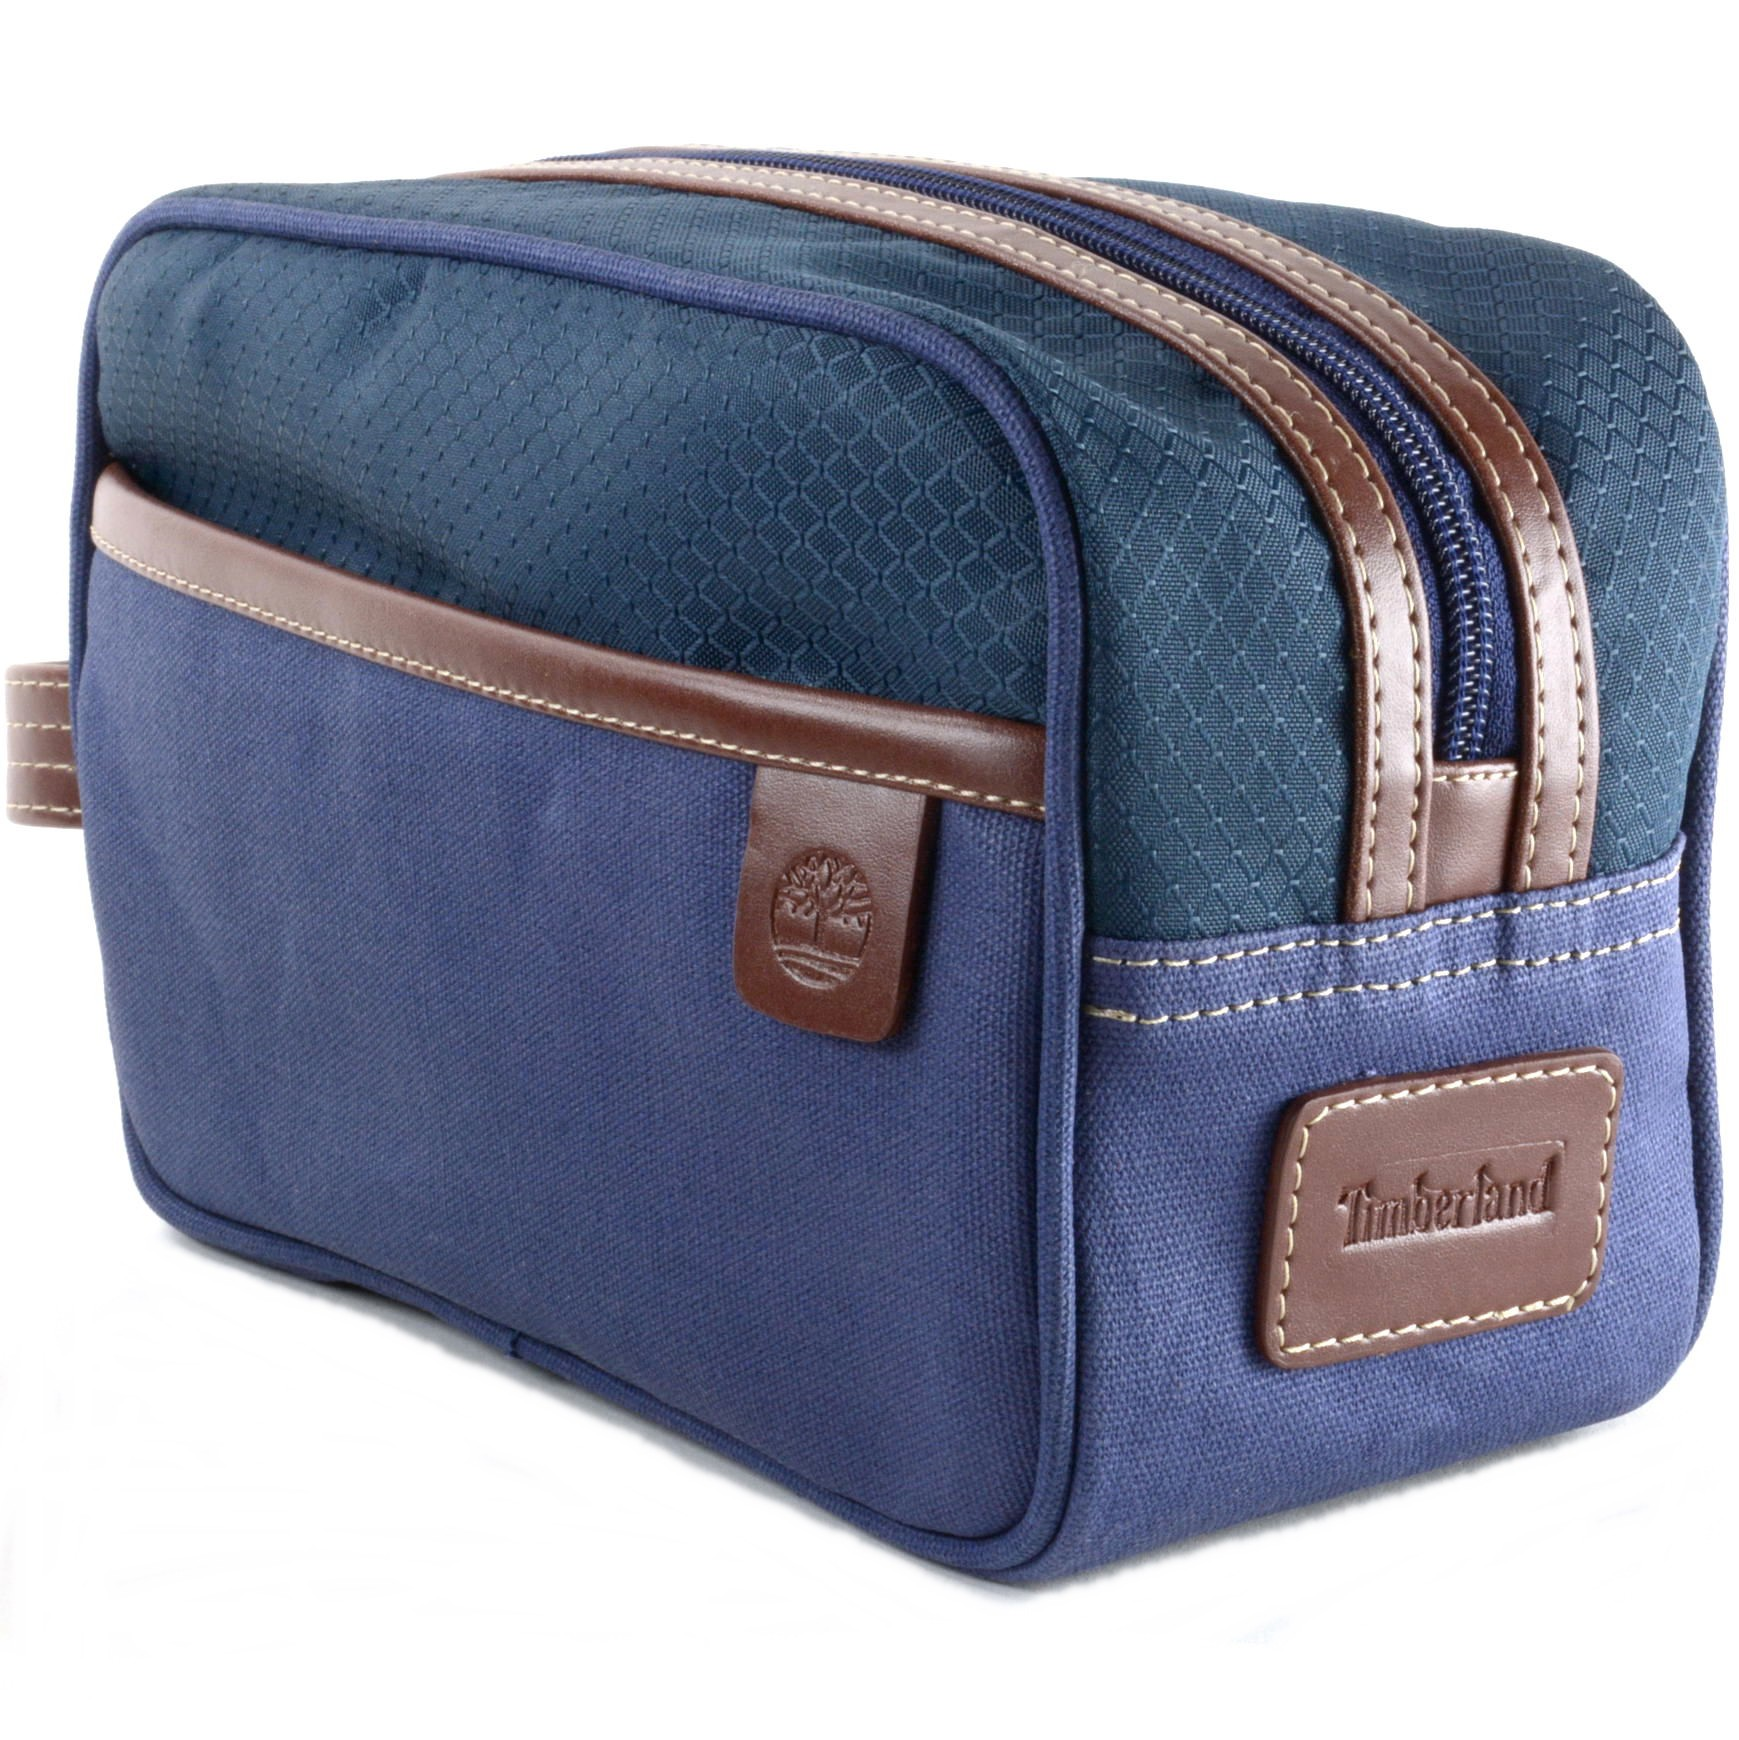 timberland toiletry bag dopp kit clutch handle canvas case. Black Bedroom Furniture Sets. Home Design Ideas